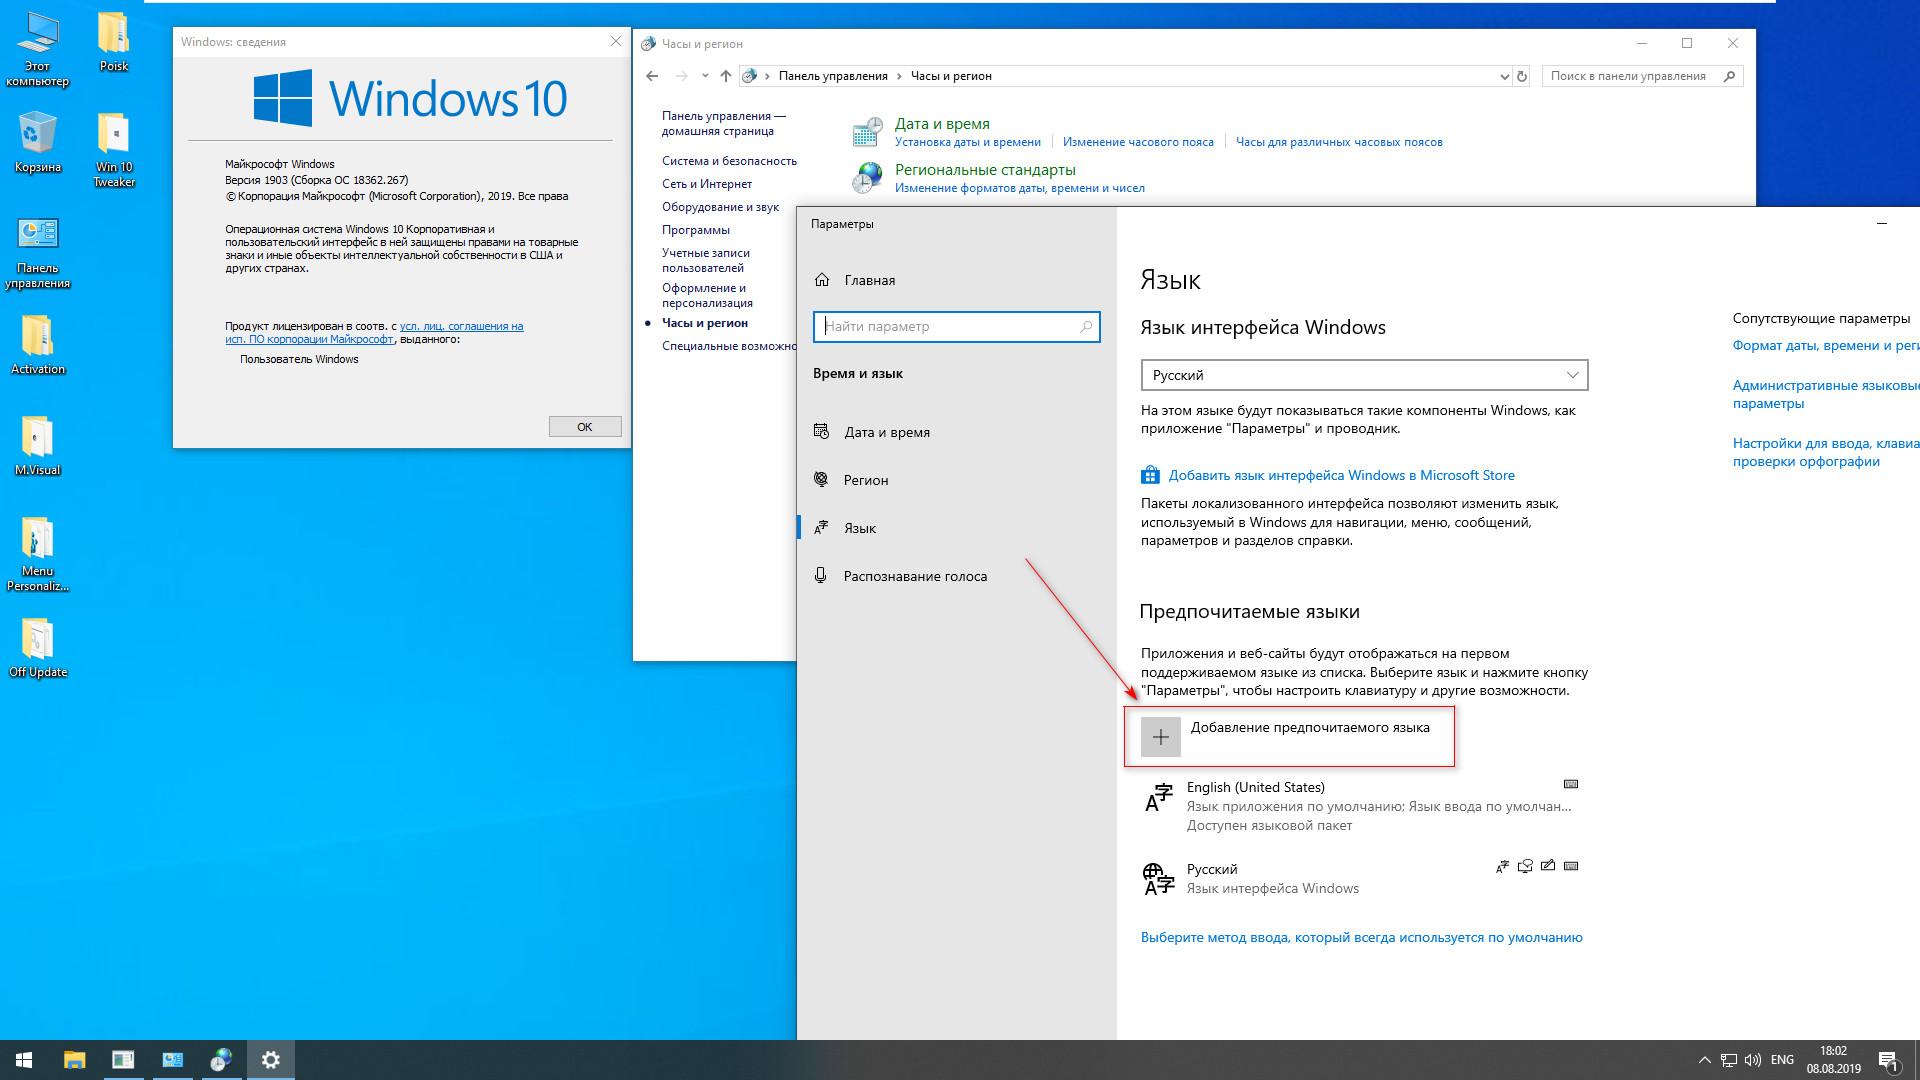 Windows 10 Enterprise x64 lite 1903 build 18362.267 by Zosma.iso - 러시아어 한글화 시도 - 그래서 그냥 원본대로 설치 후에 한글화 시도 2019-08-09_000253.jpg